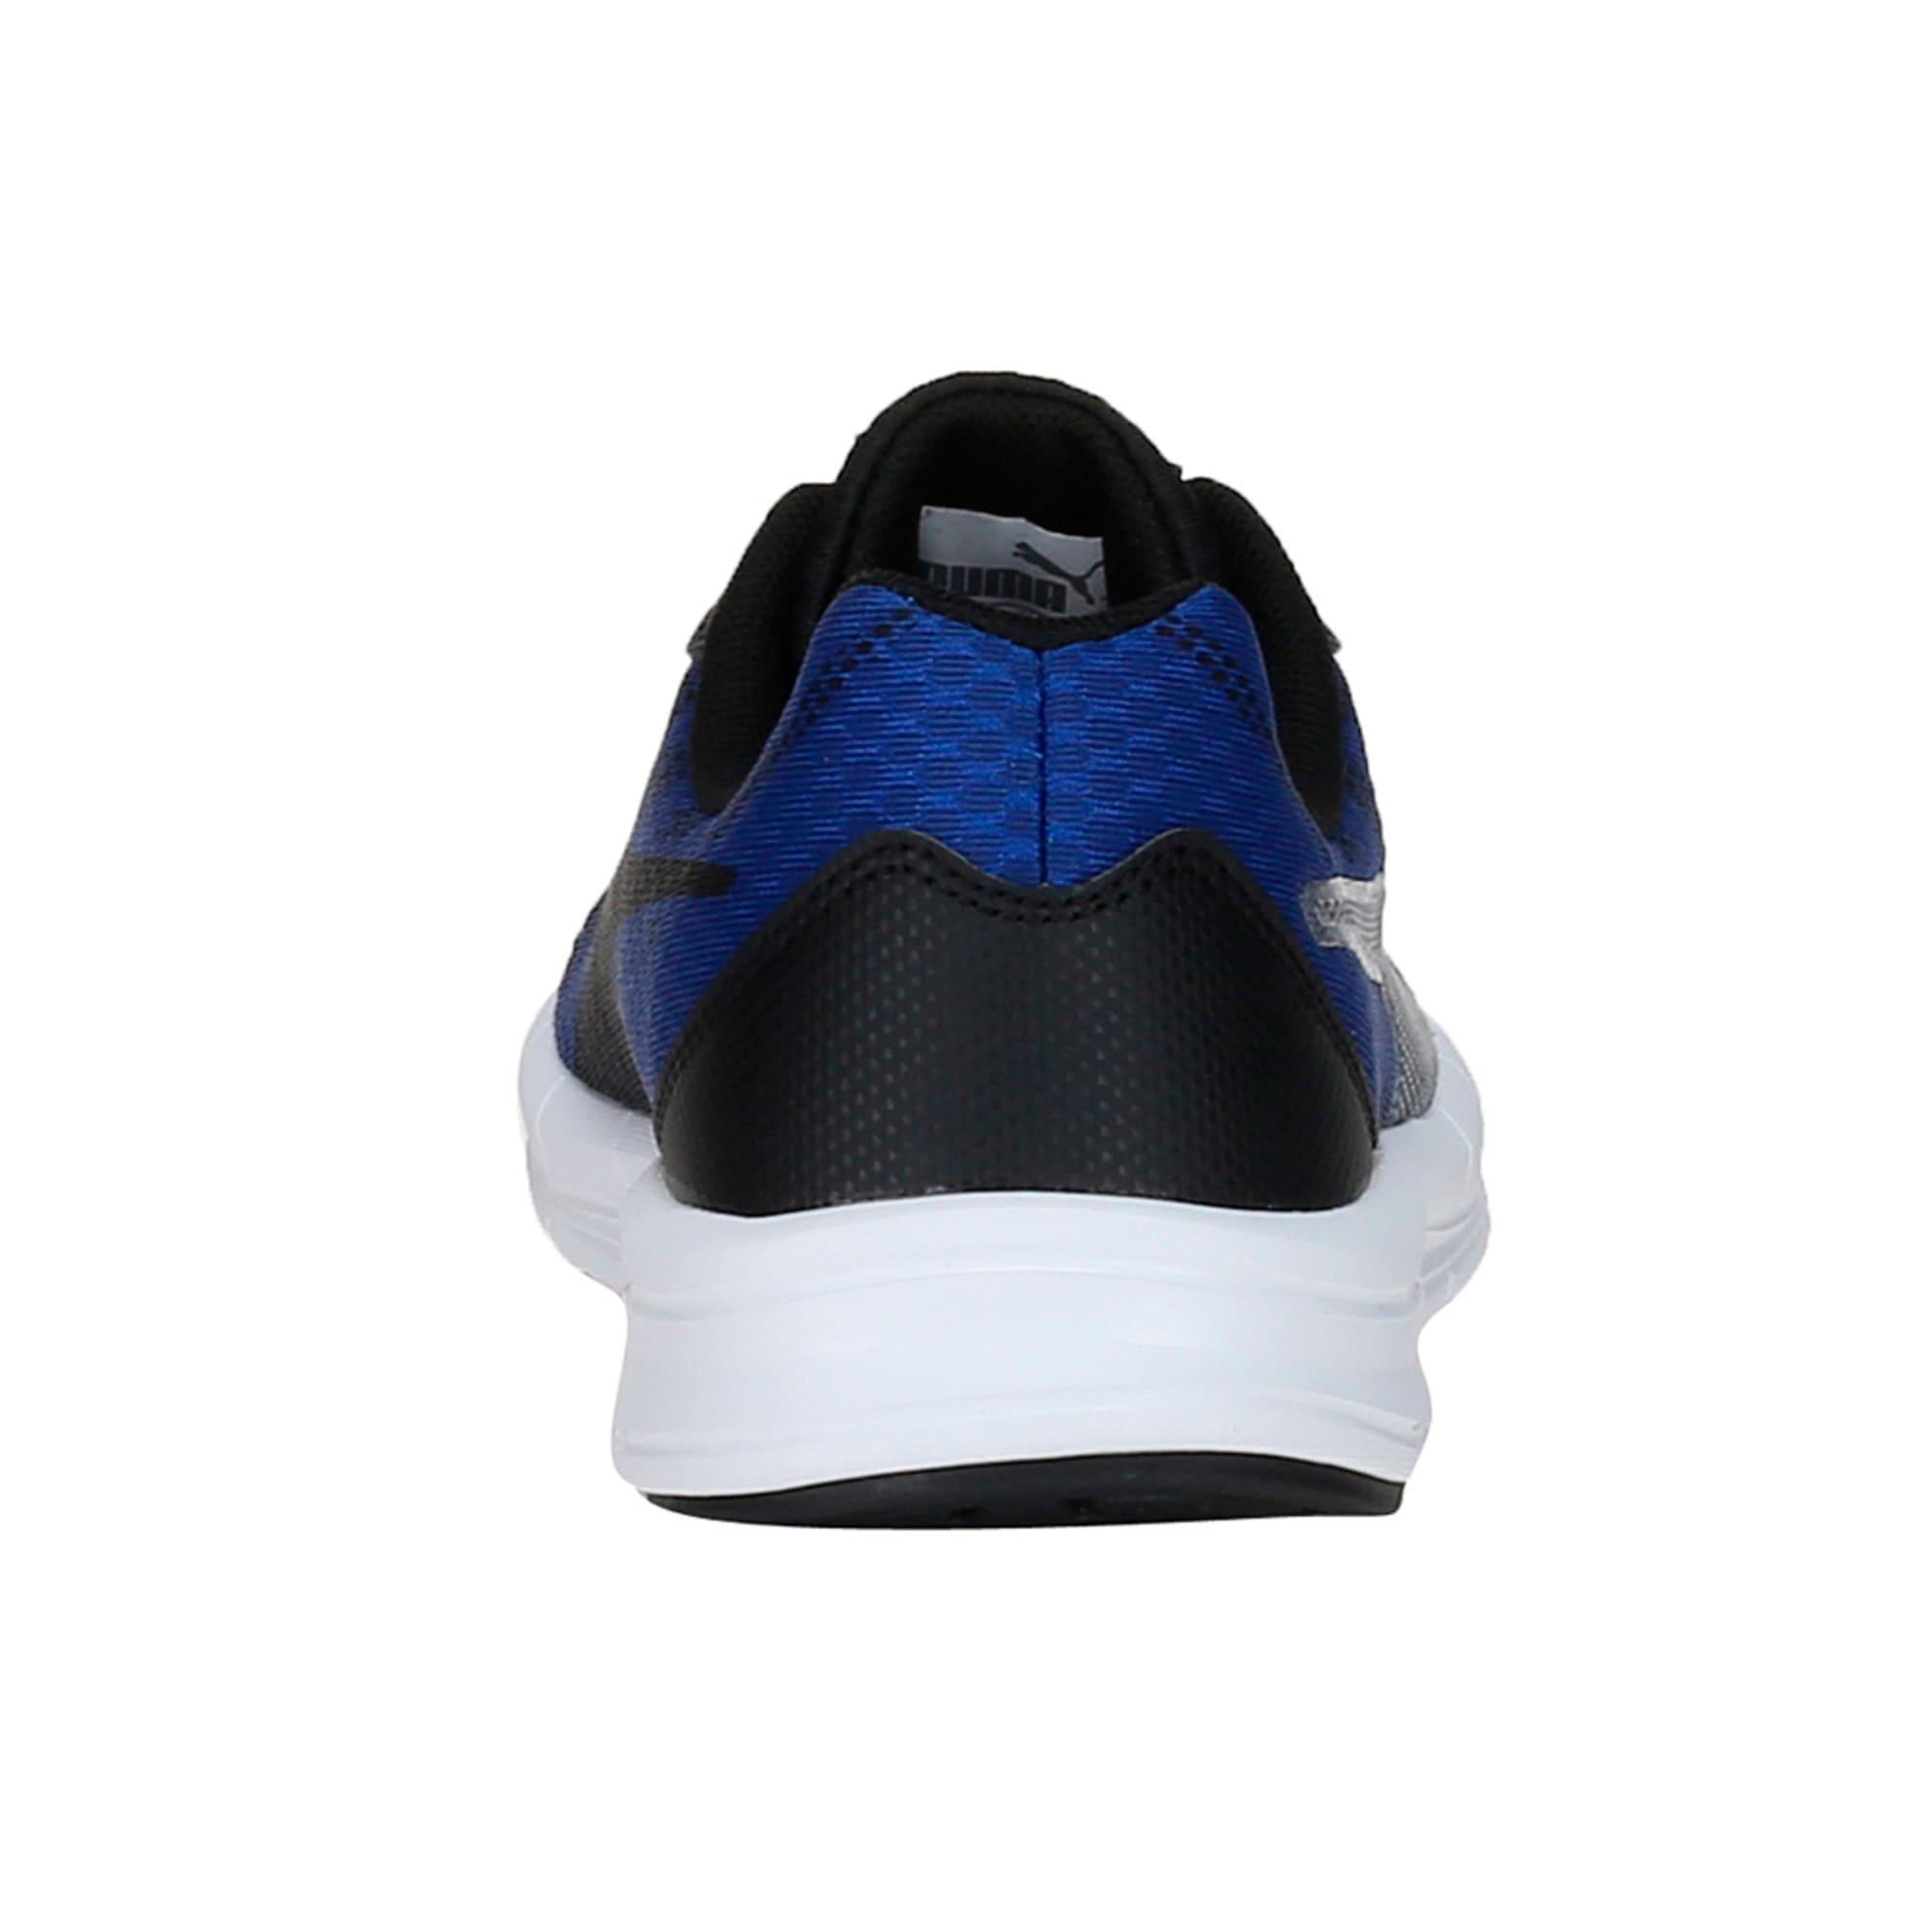 Thumbnail 4 of Meteor Jr, TRUE BLUE-Puma Black, medium-IND